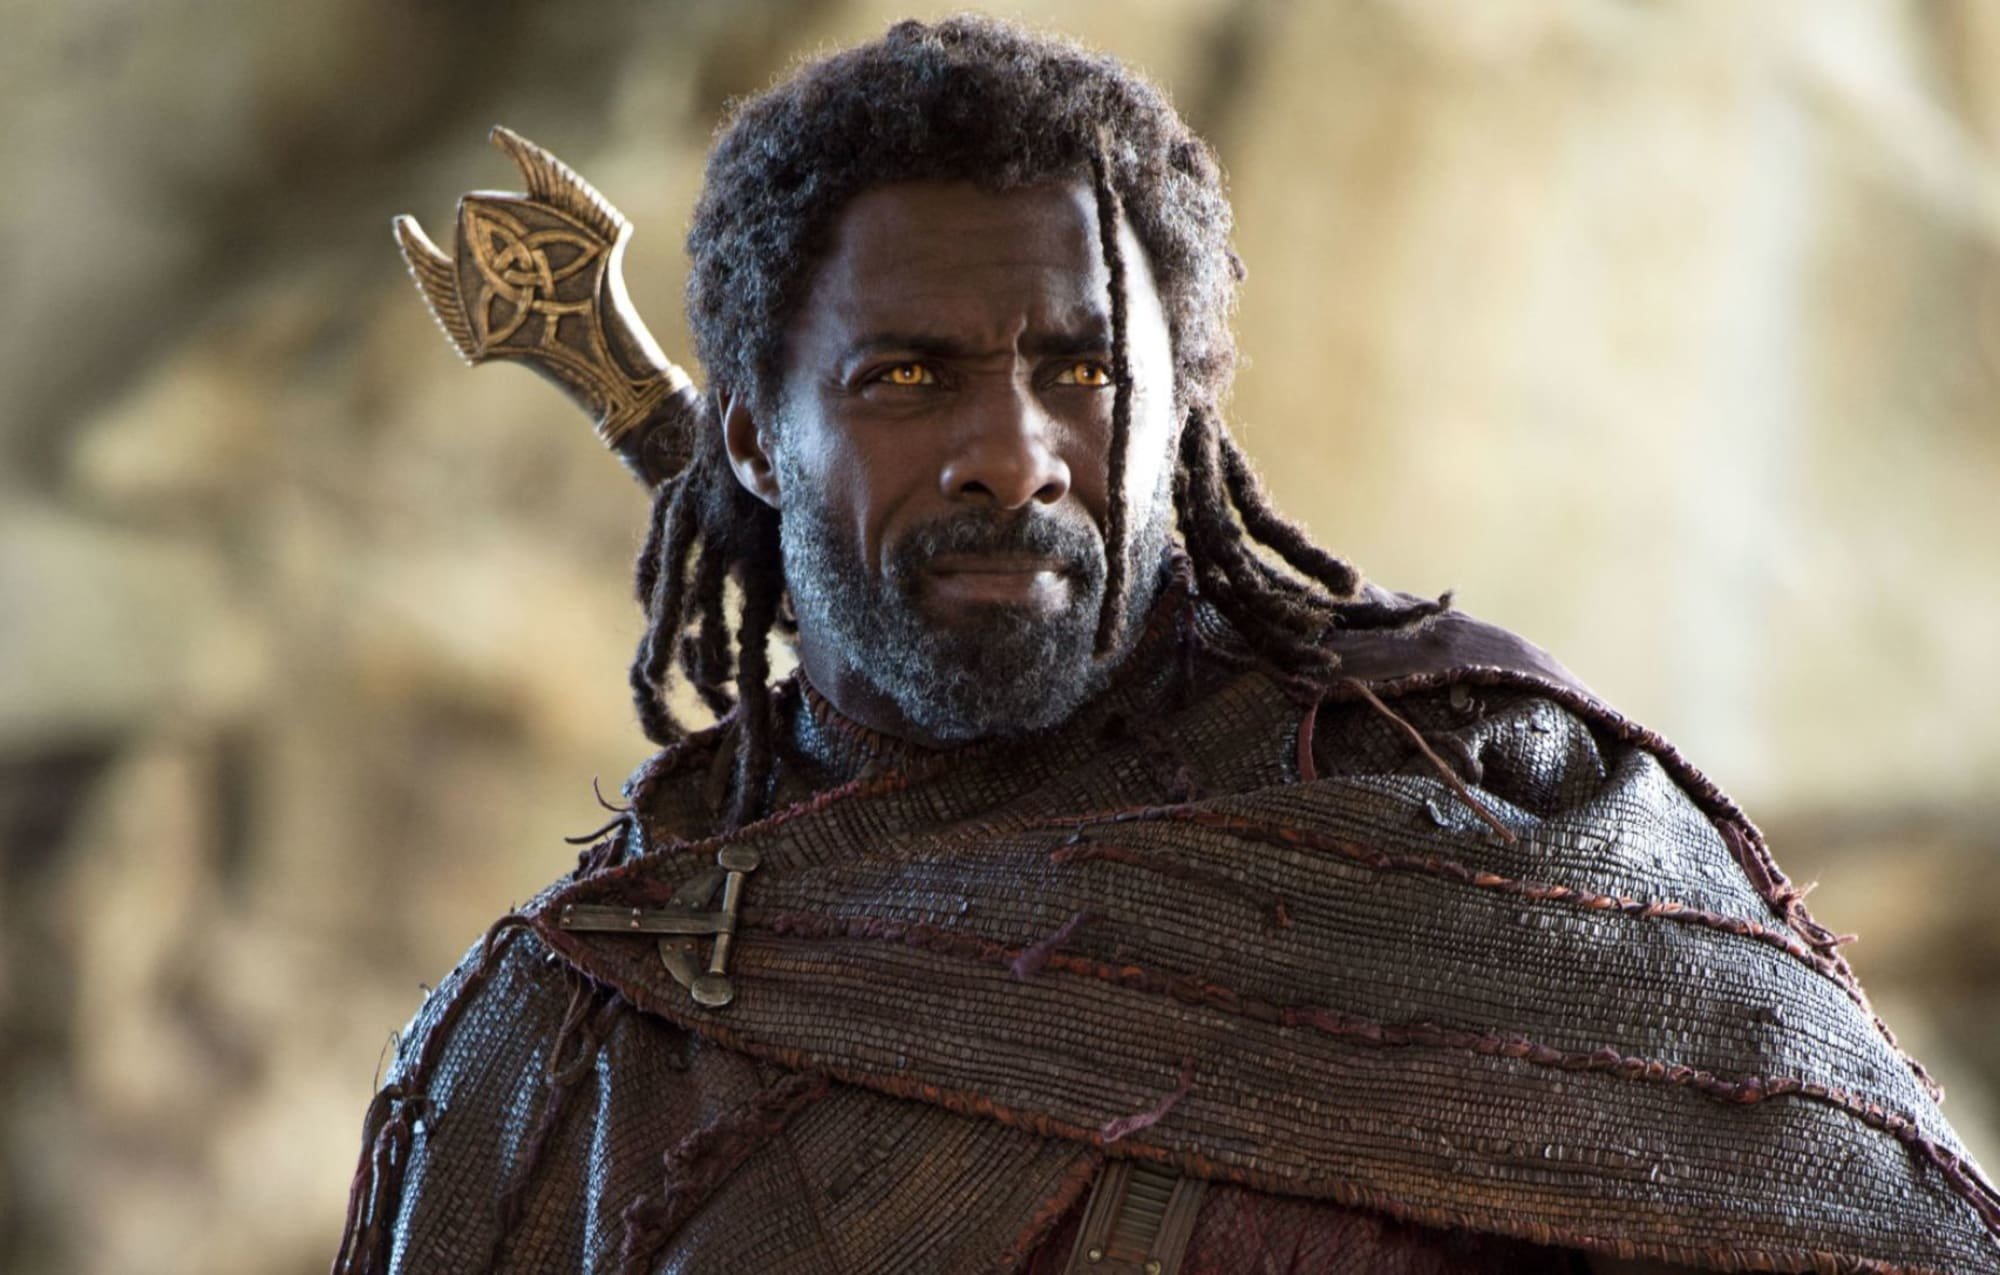 Heimdall played by Idris Elba